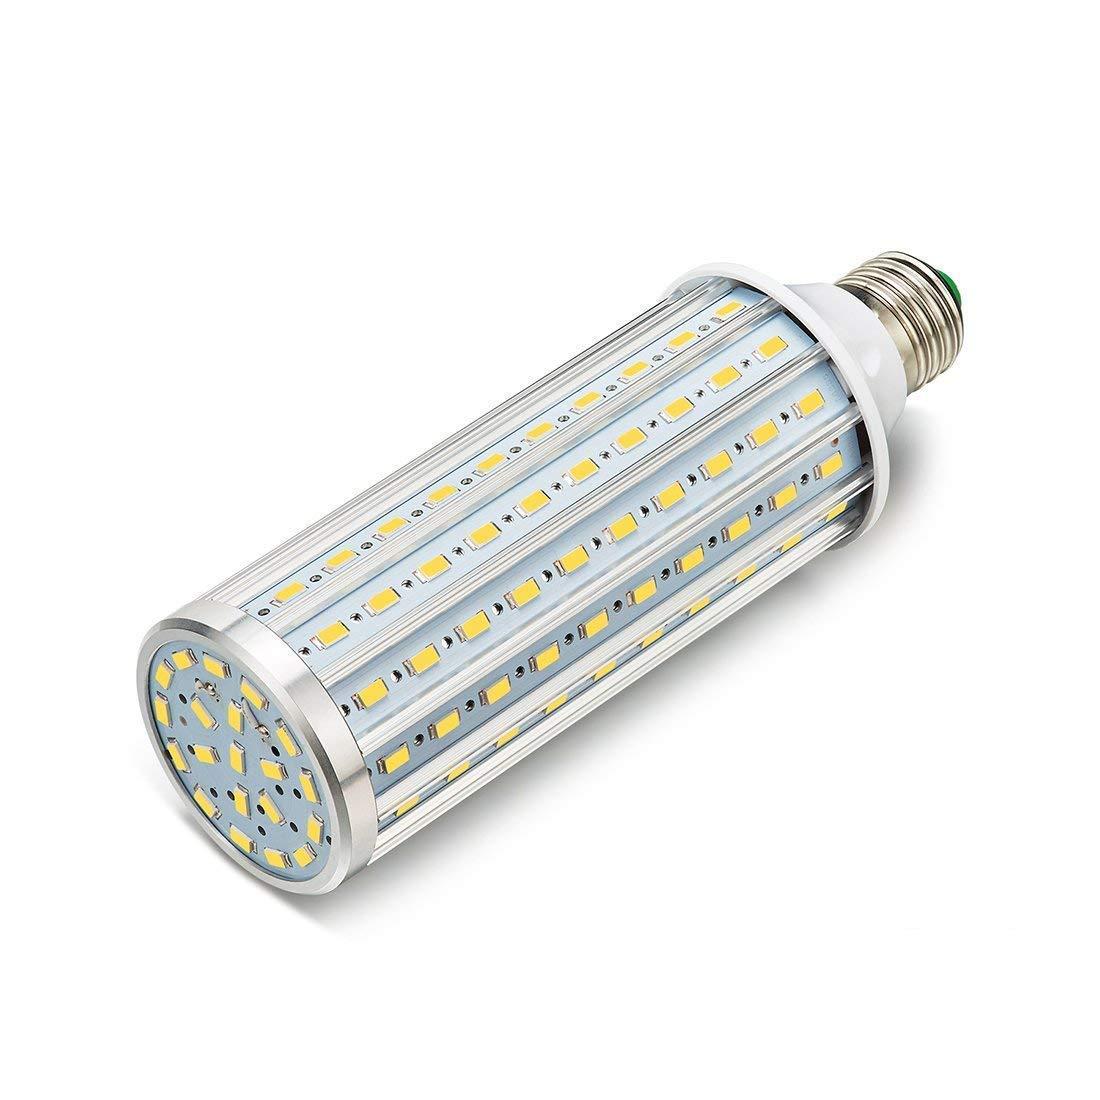 ONLT LED Corn Light Bulb,E27 35W 3450LM(Equivalent a 350W),LED Aluminum High Power Corn Light Bulb,for Workshop, Warehouse, Factory, Porch, Backyard,High Bay Barn,Super Bright (35W-Naturally White)